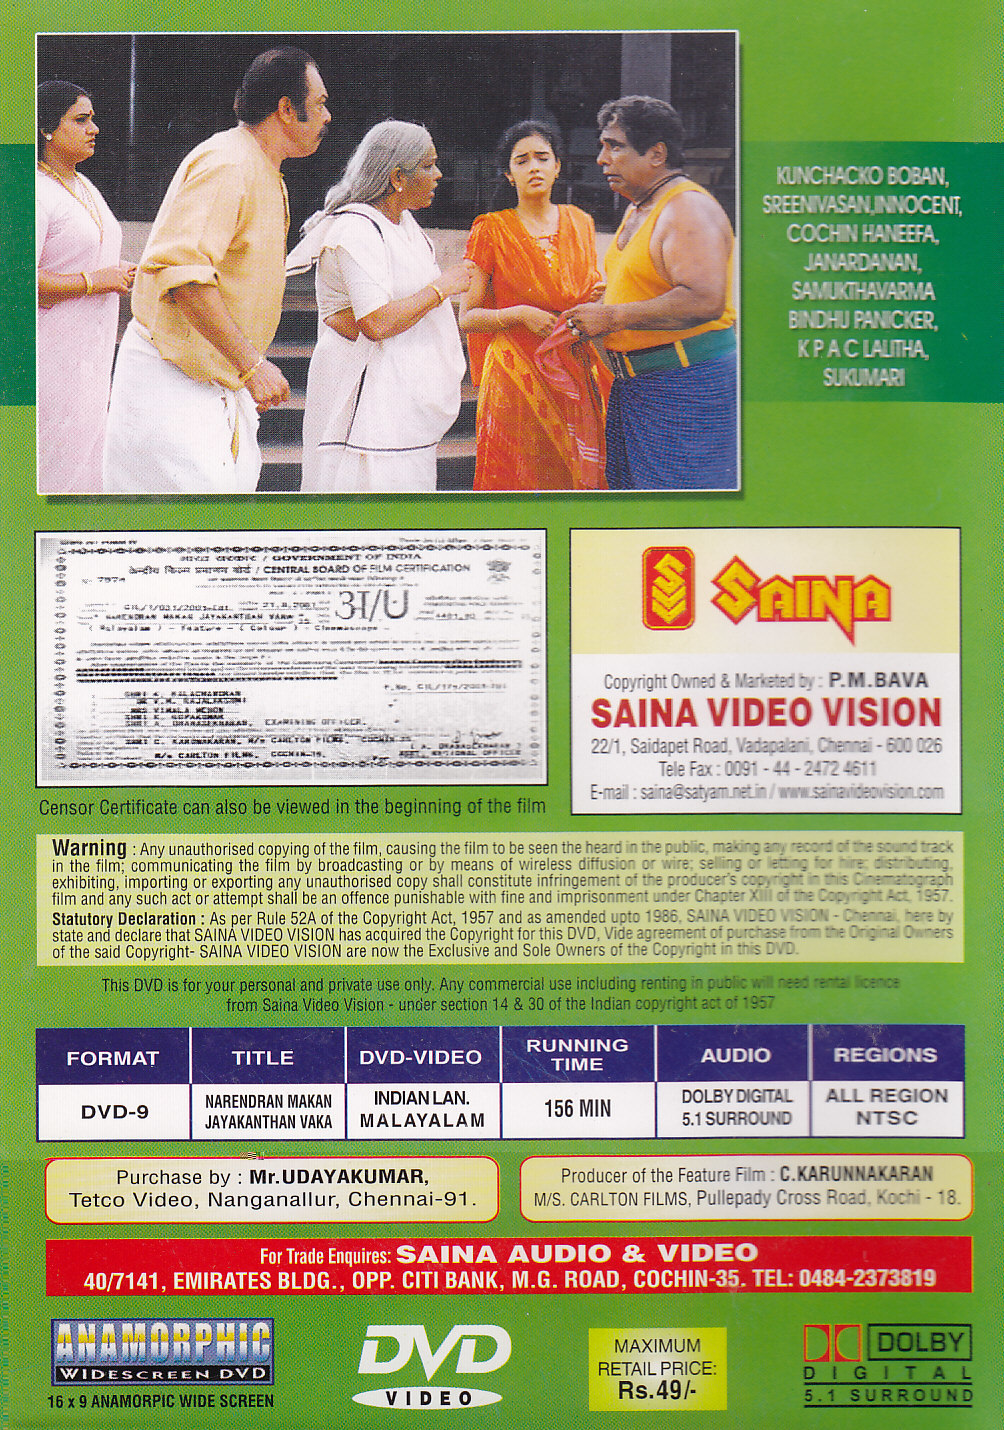 Narendran Makan Jayakanthan Vaka DVD Screenshots (Saina) Narendran_Makan_Jayakanthan_B